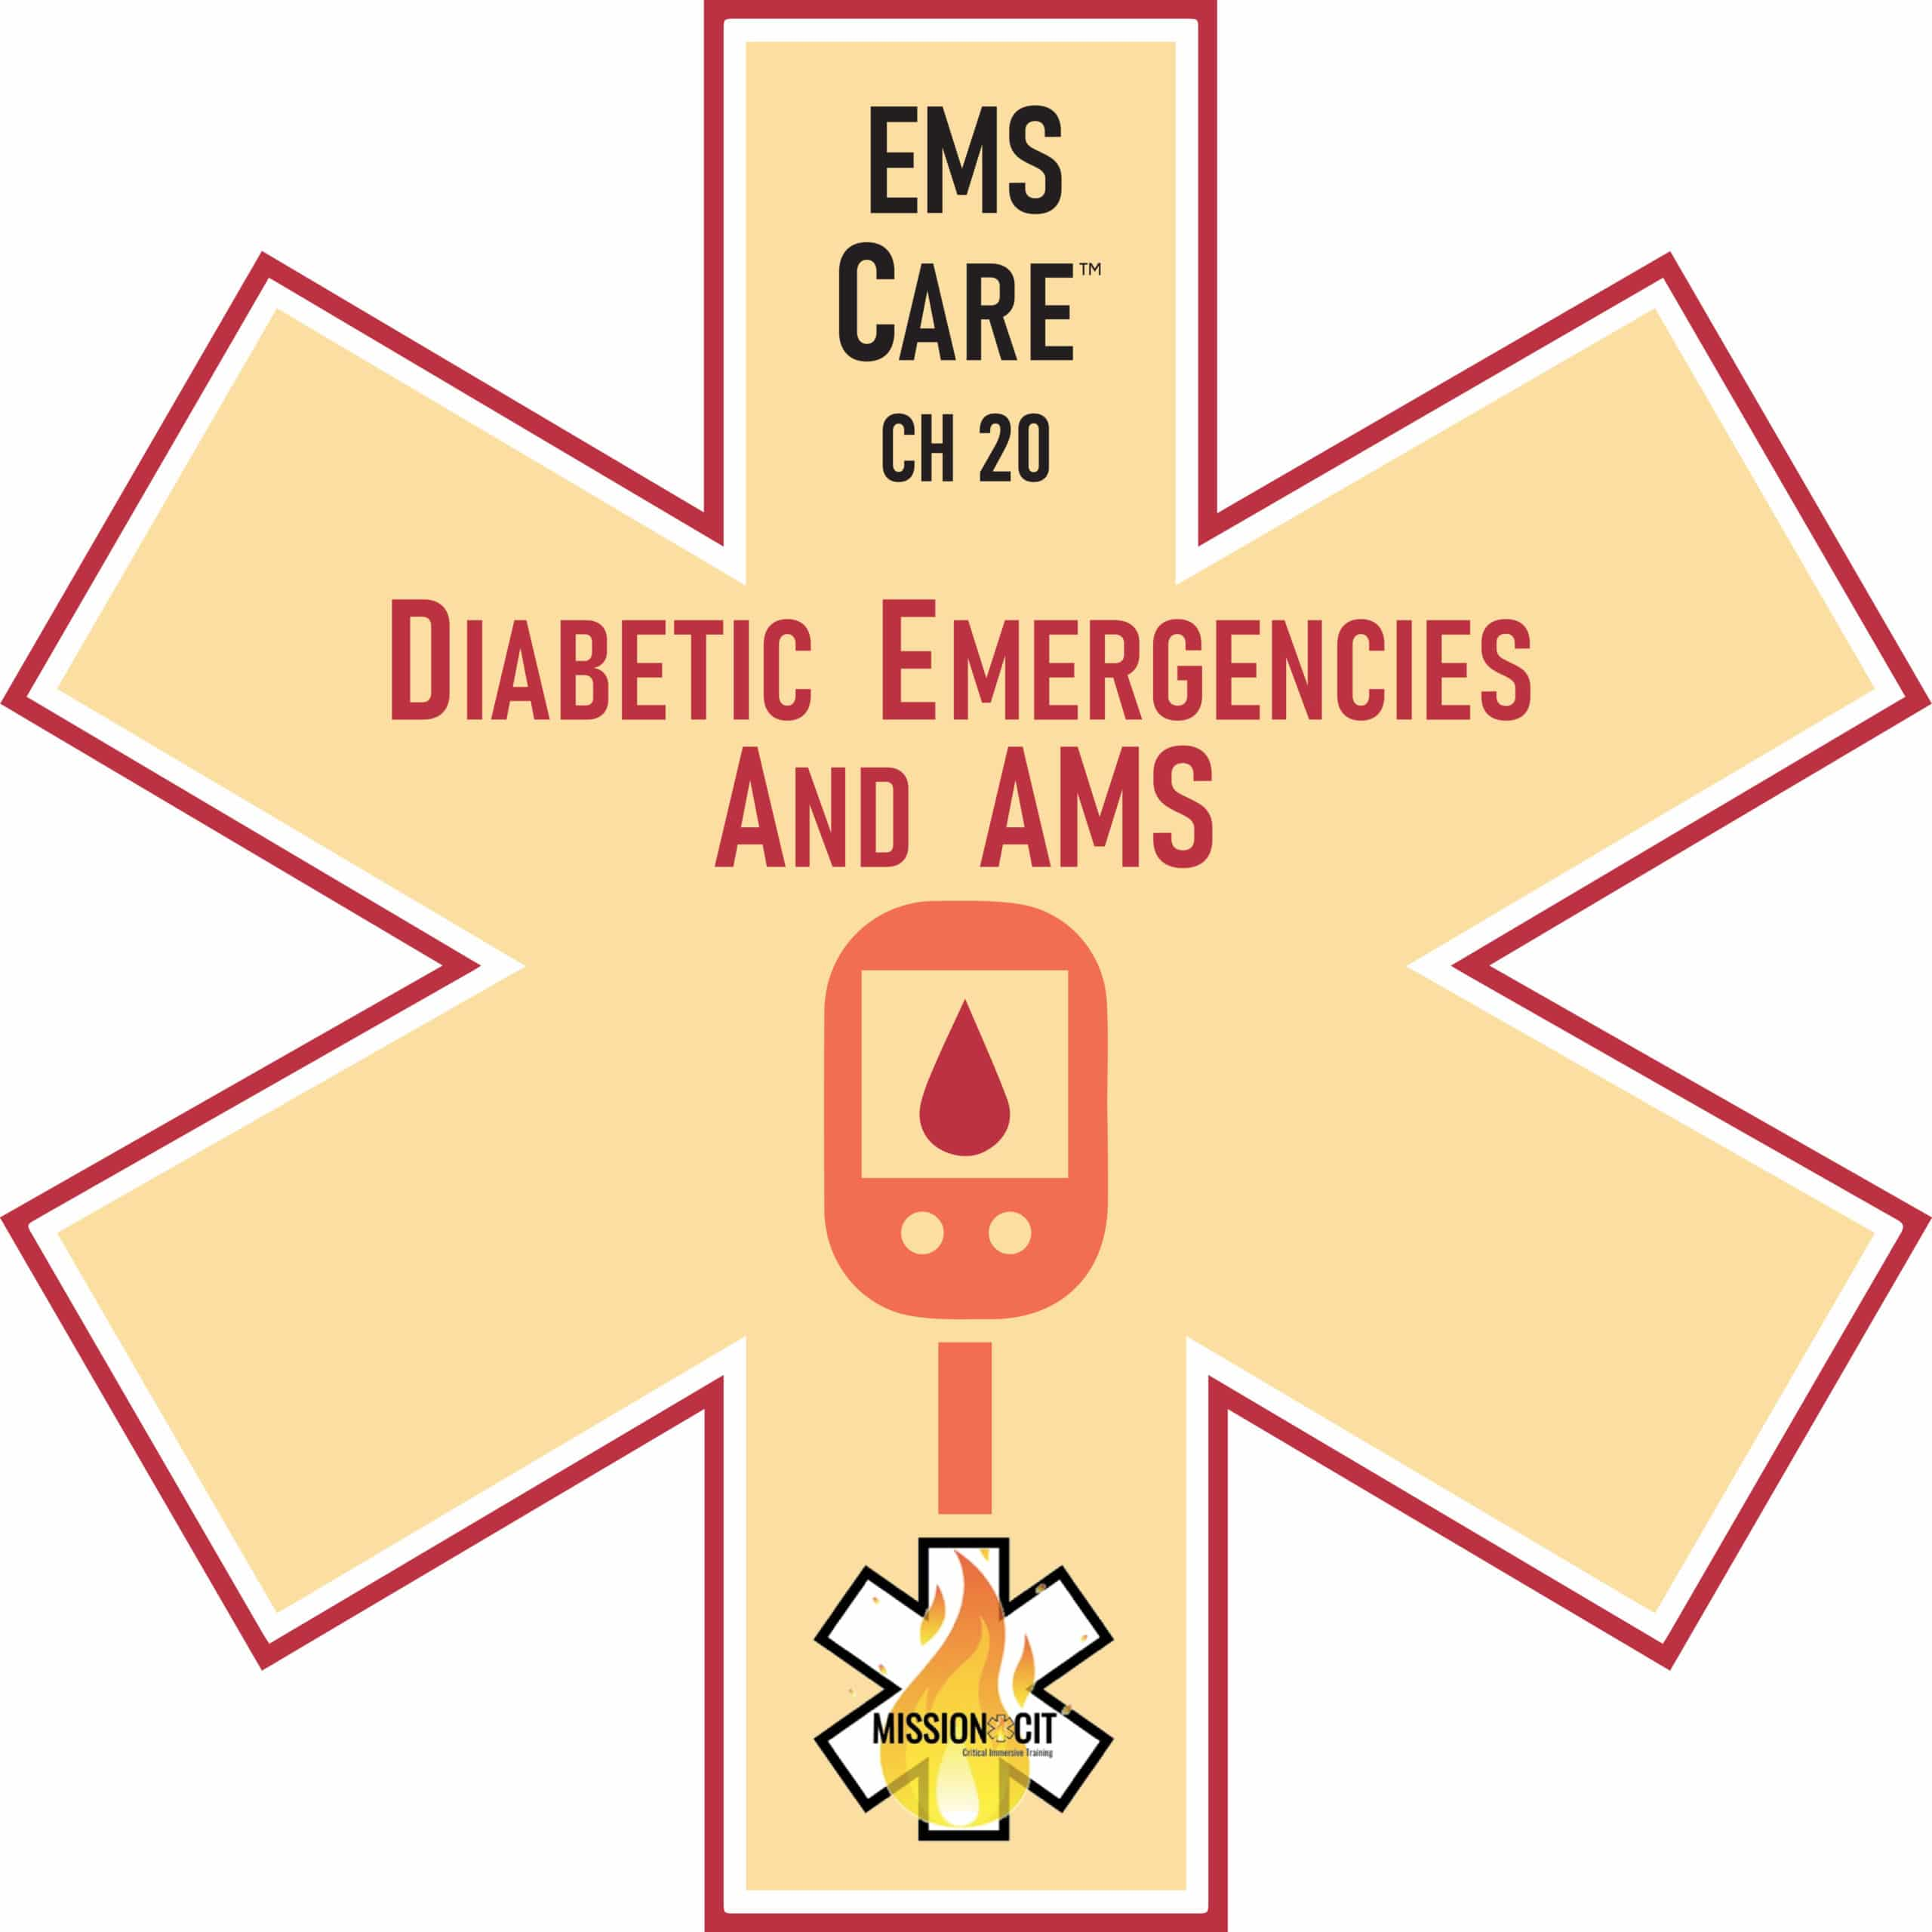 missioncit-ems-care-diabetic-emergencies-and-ams